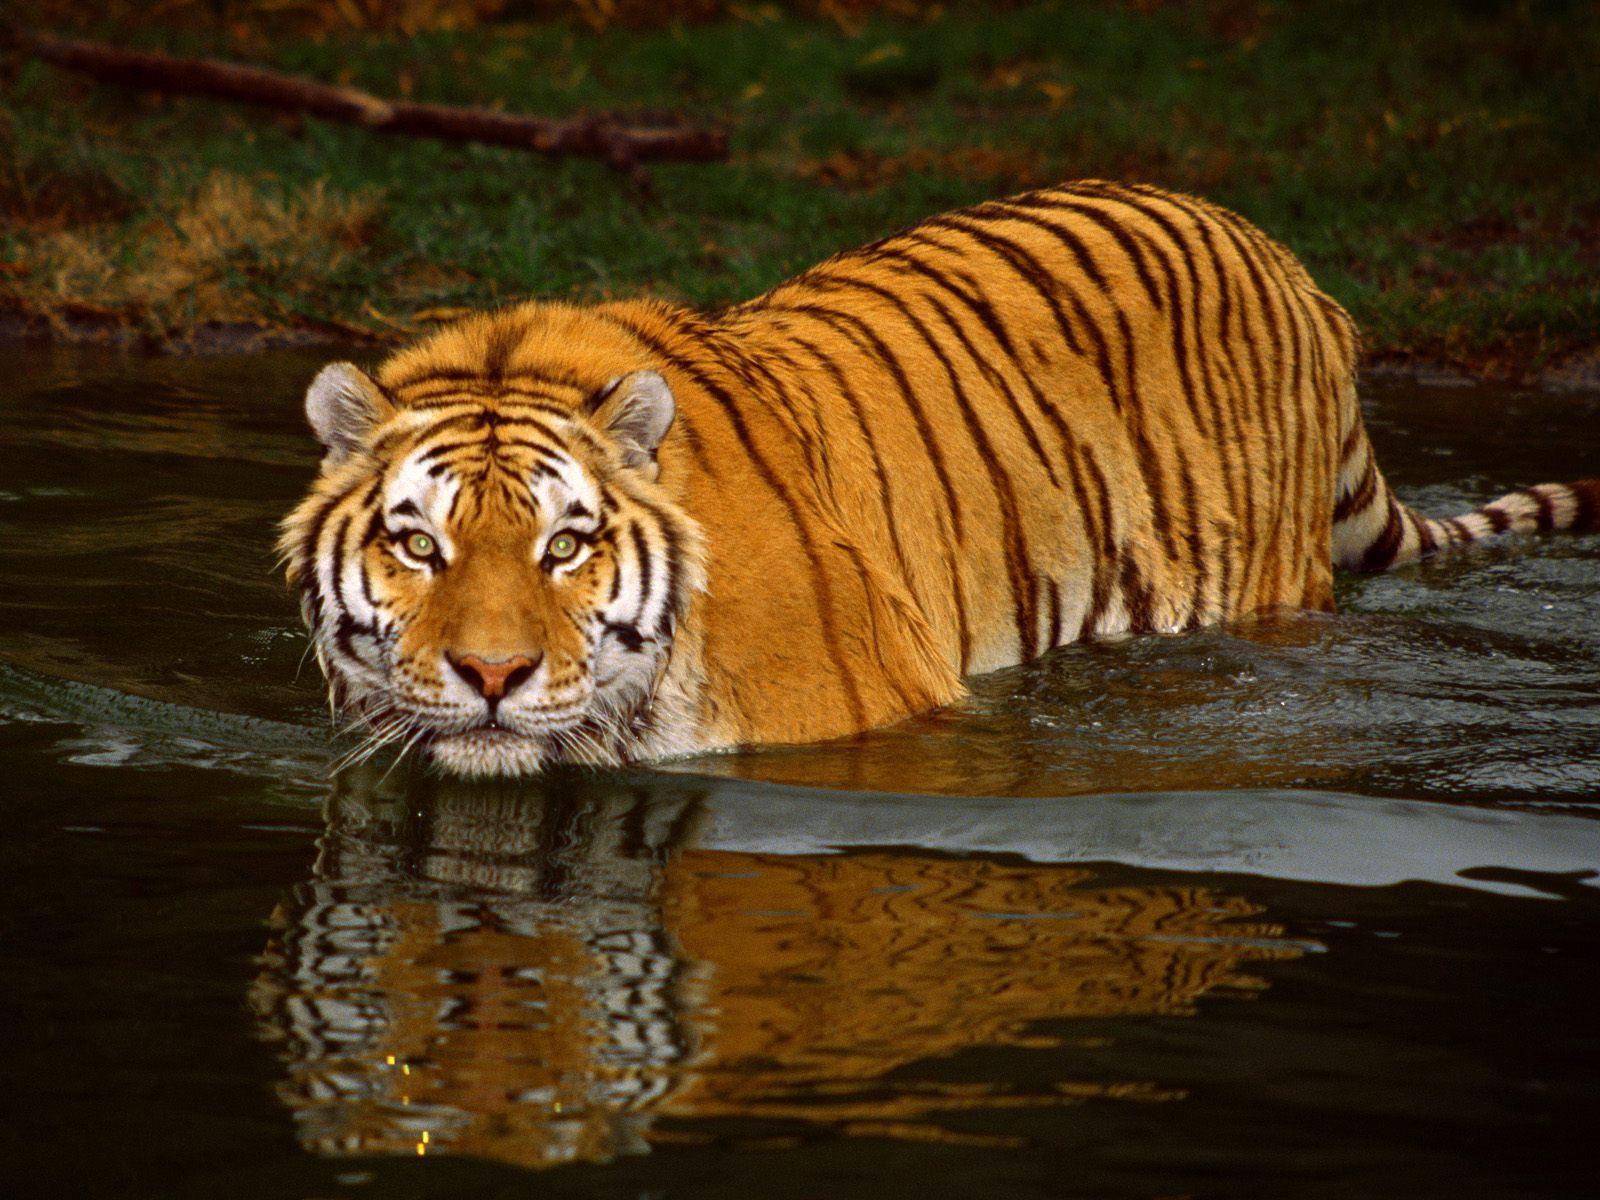 wallpaper menu: high definition tiger desktop wallpapers